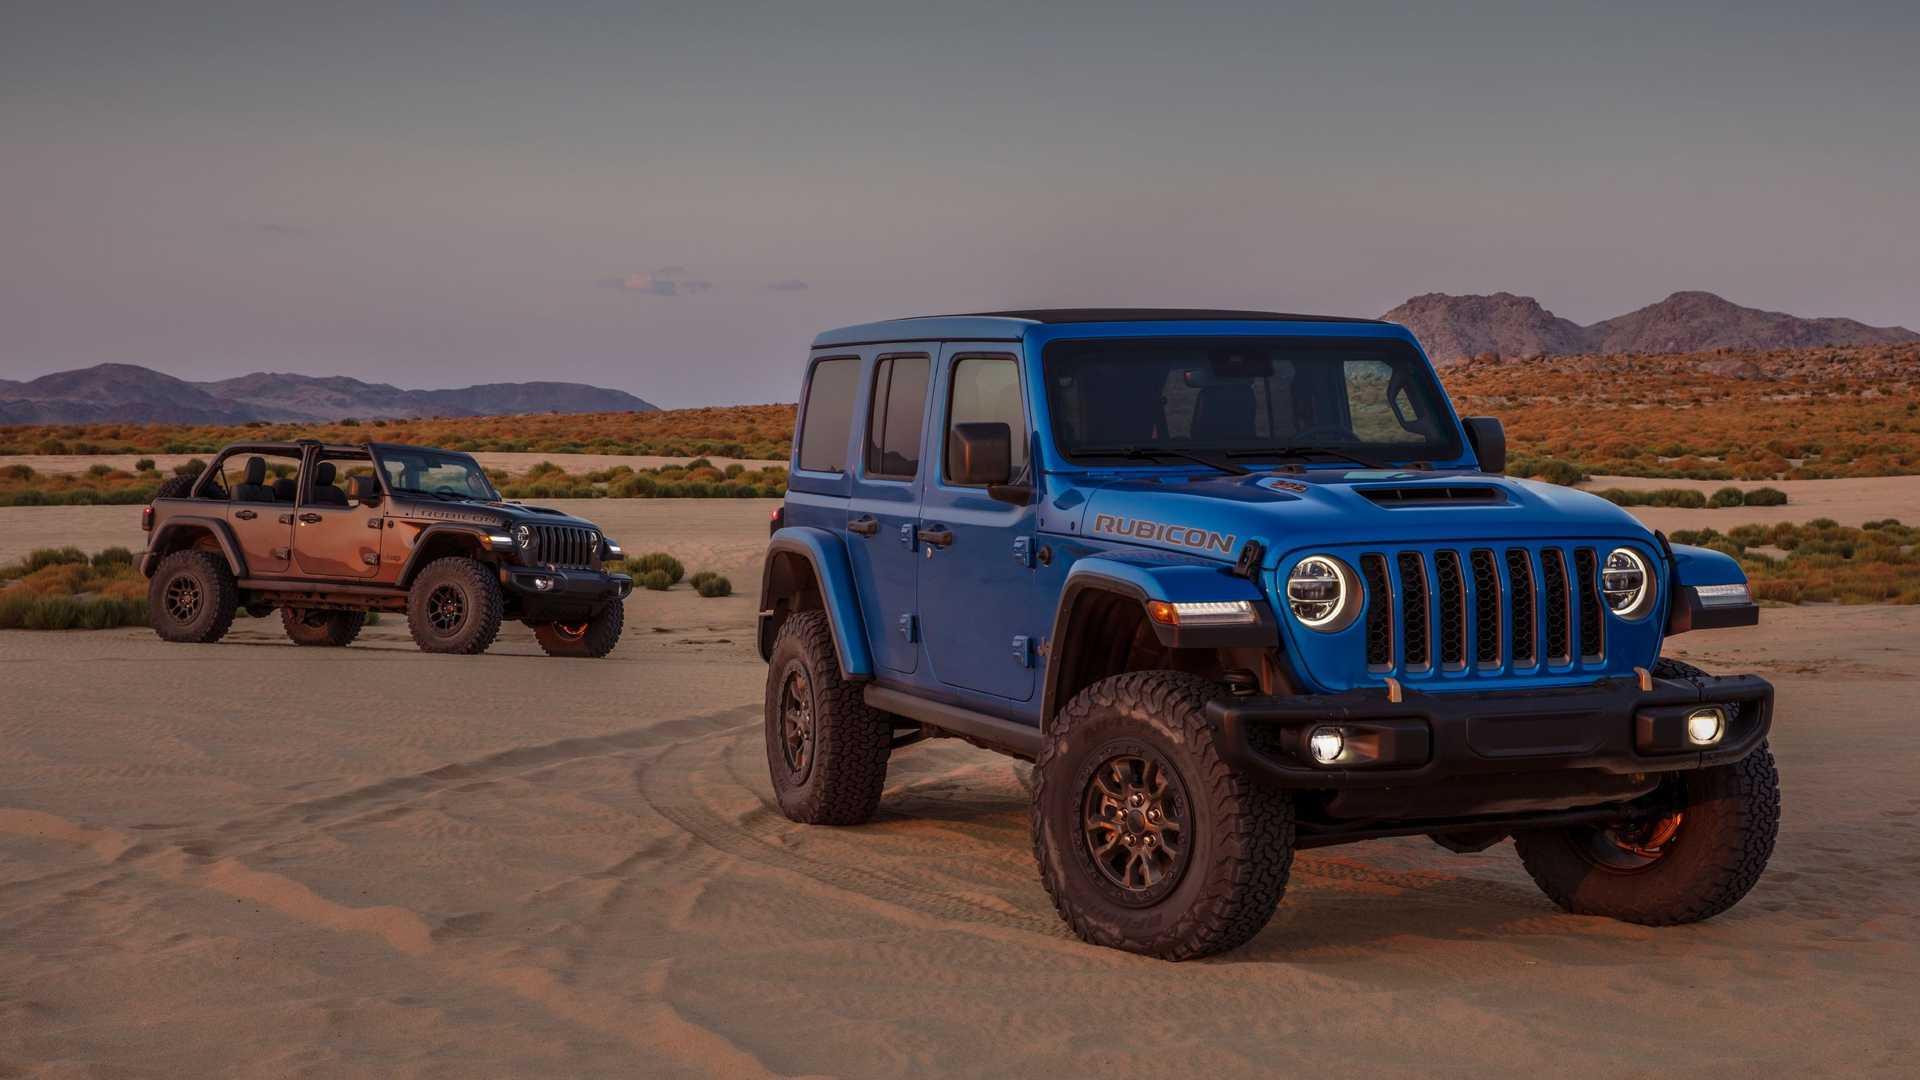 2021 Jeep Wrangler Rubicon 392 Front View